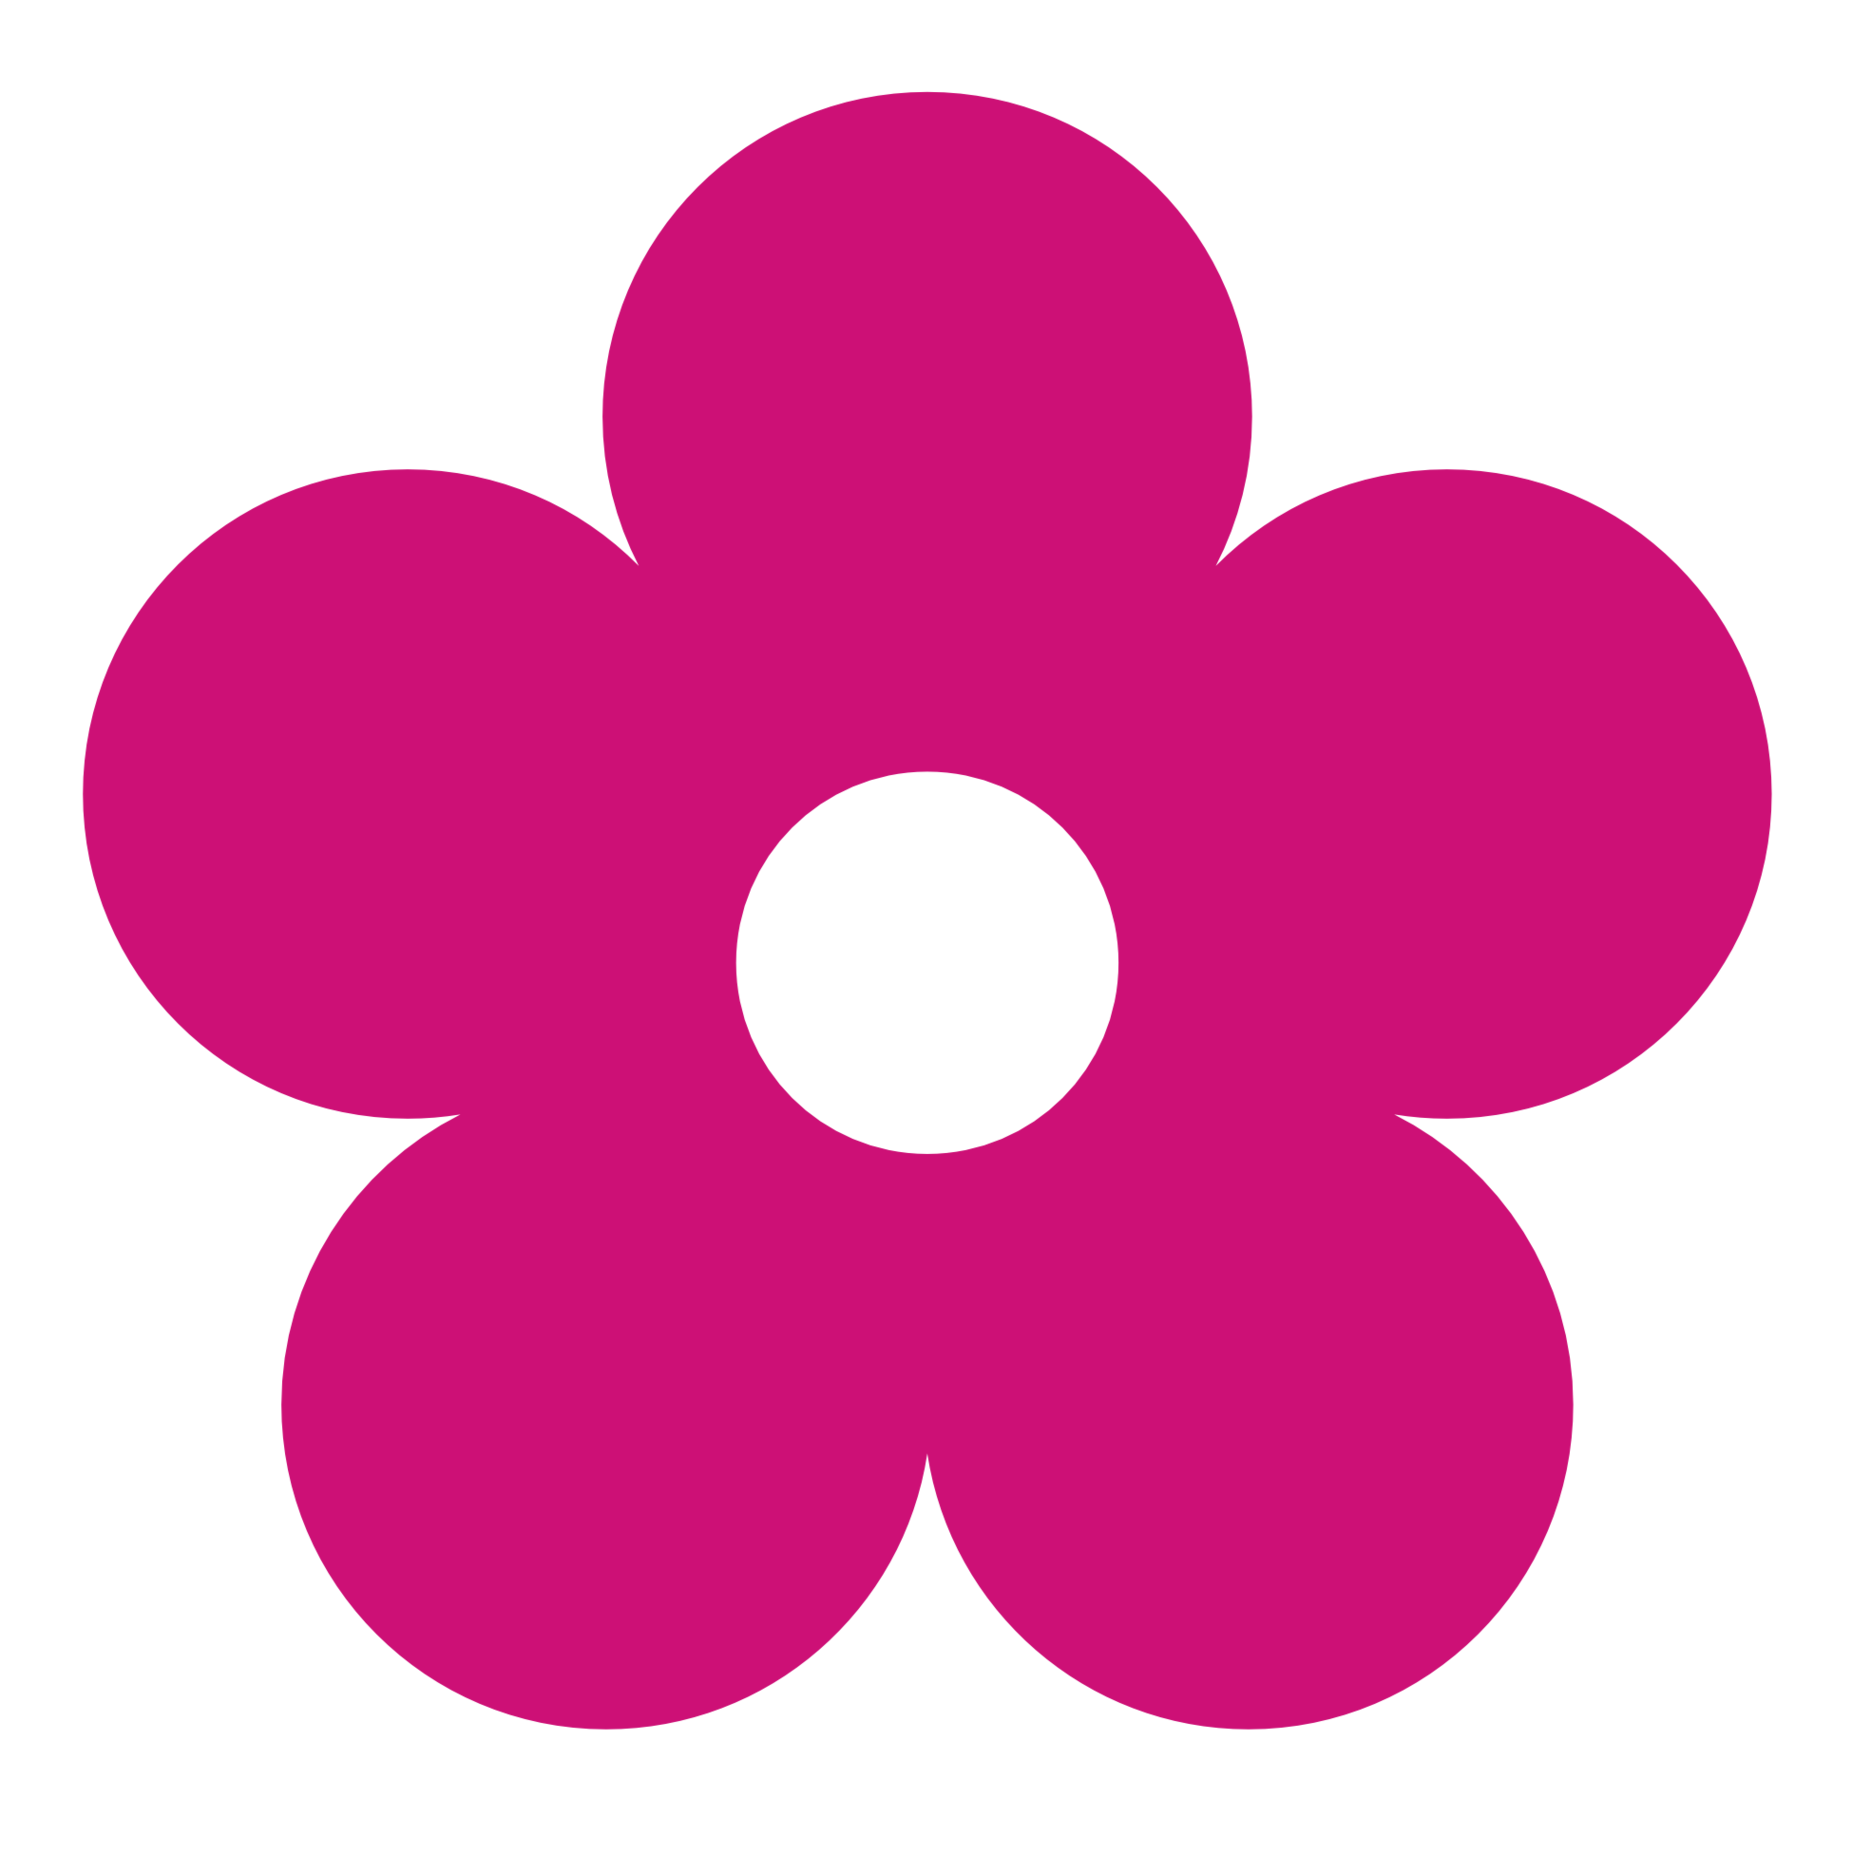 Flower clipart pink.